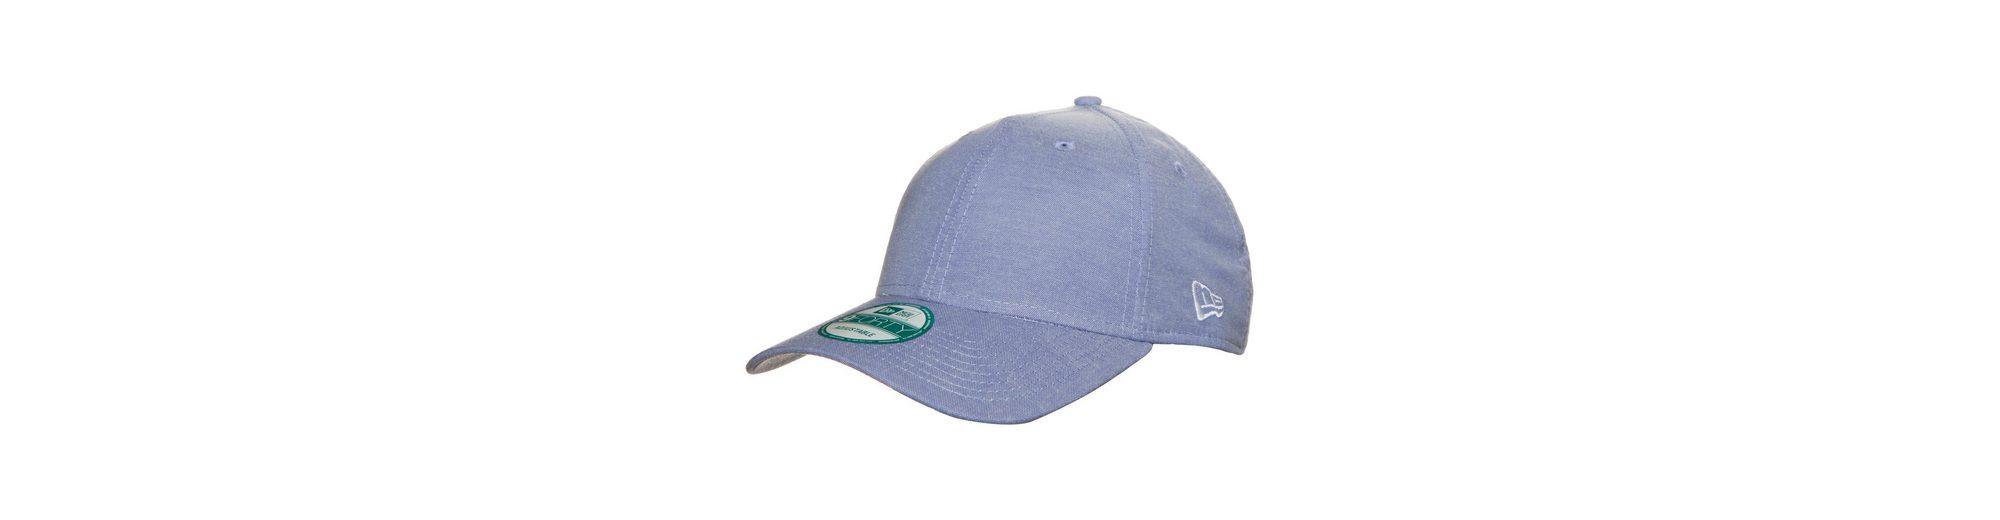 New Era 9FORTY Strapback Cap